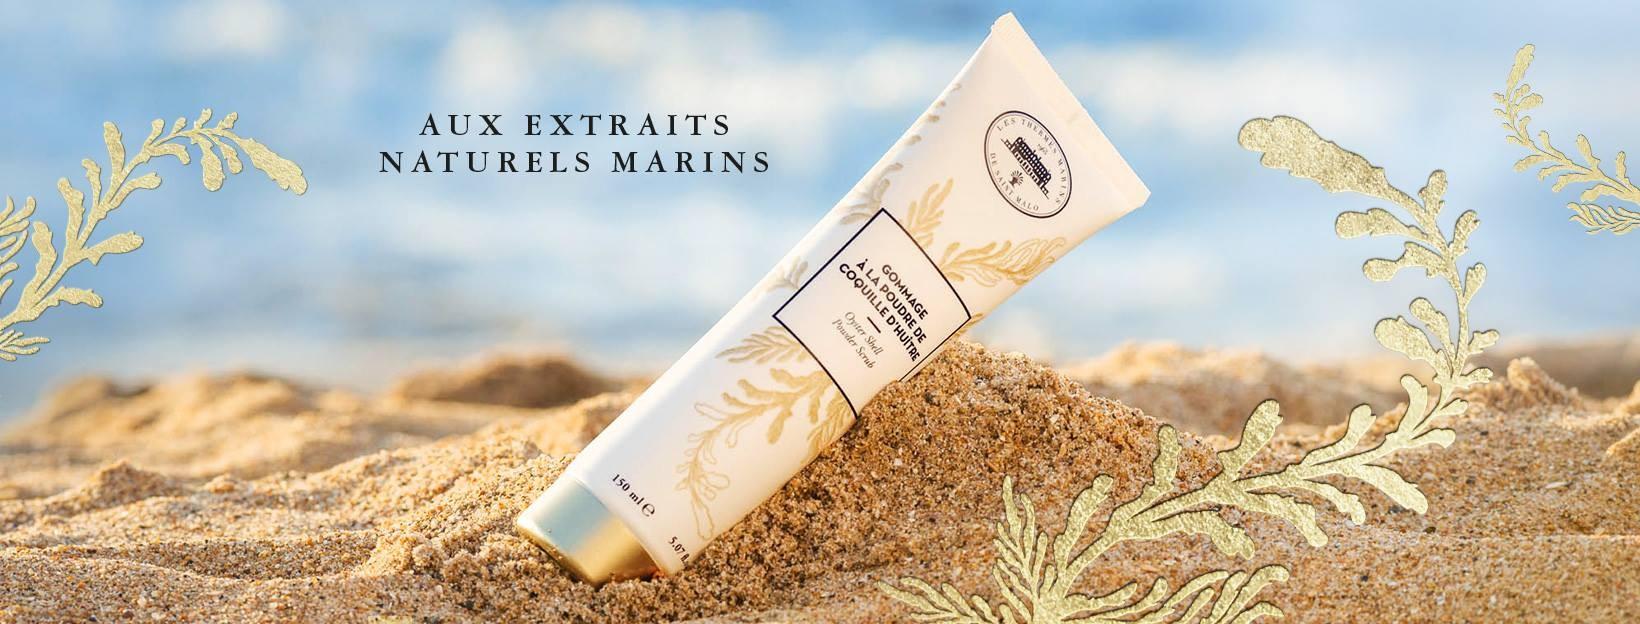 Cosmetique Thermes Marins De Saint Malo Linkedin